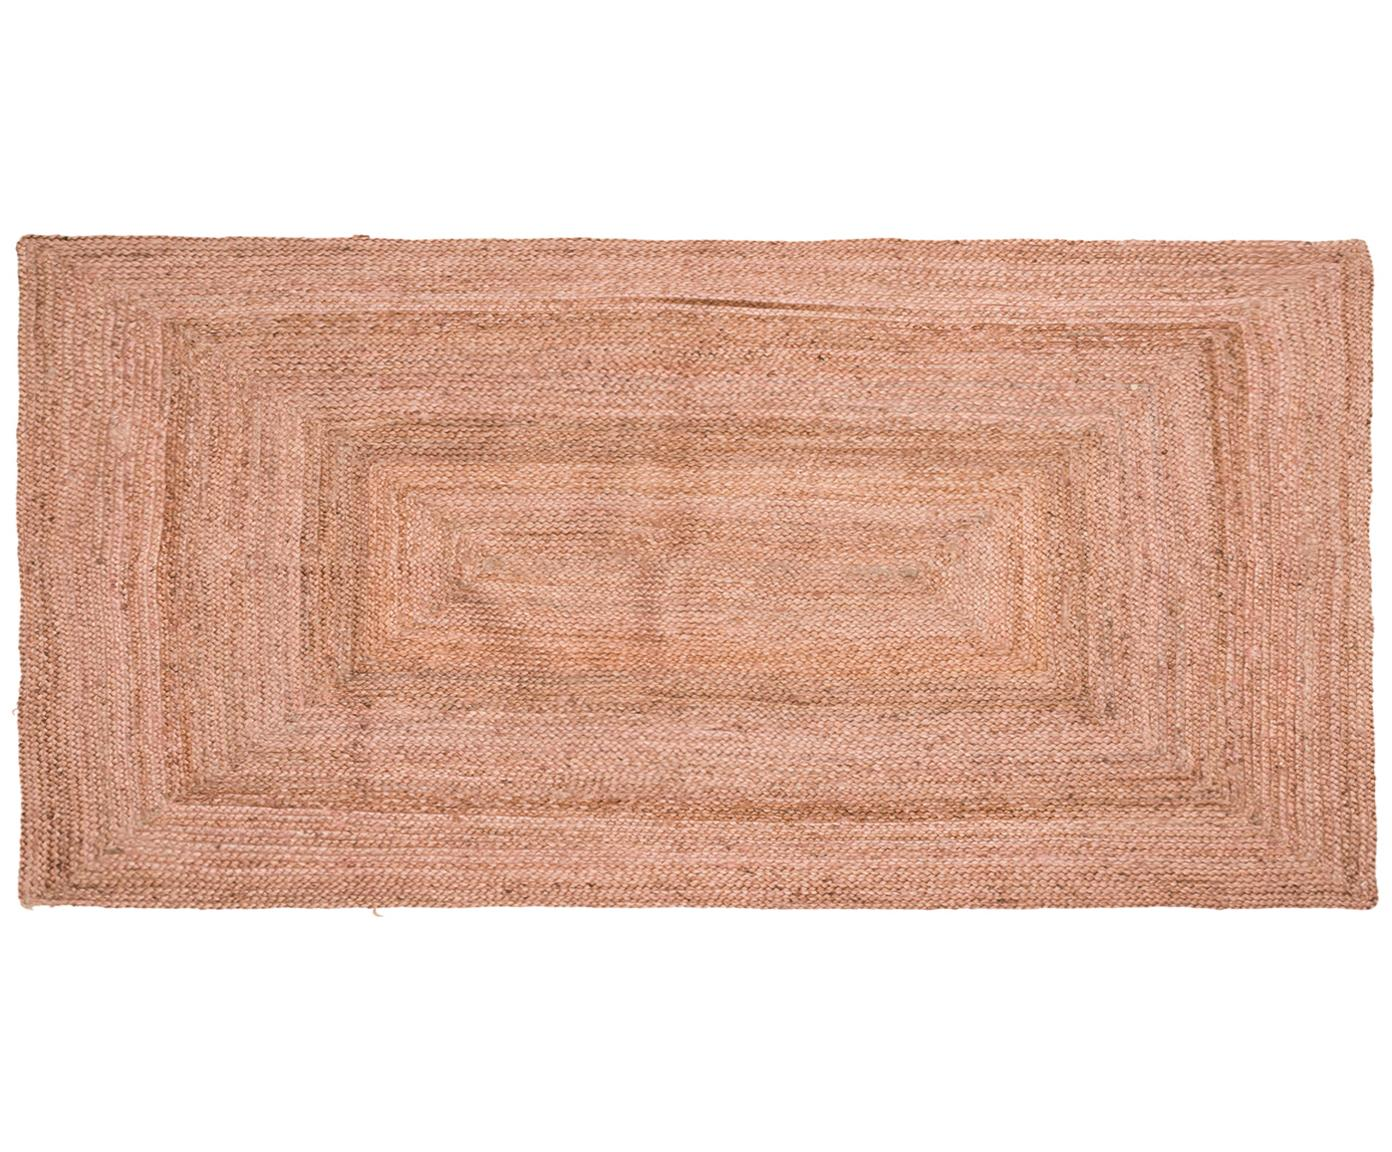 Tappeto in juta chiaro Pampas, Juta, Rosa chiaro, Larg. 60 x Lung. 120 cm (taglia XS)